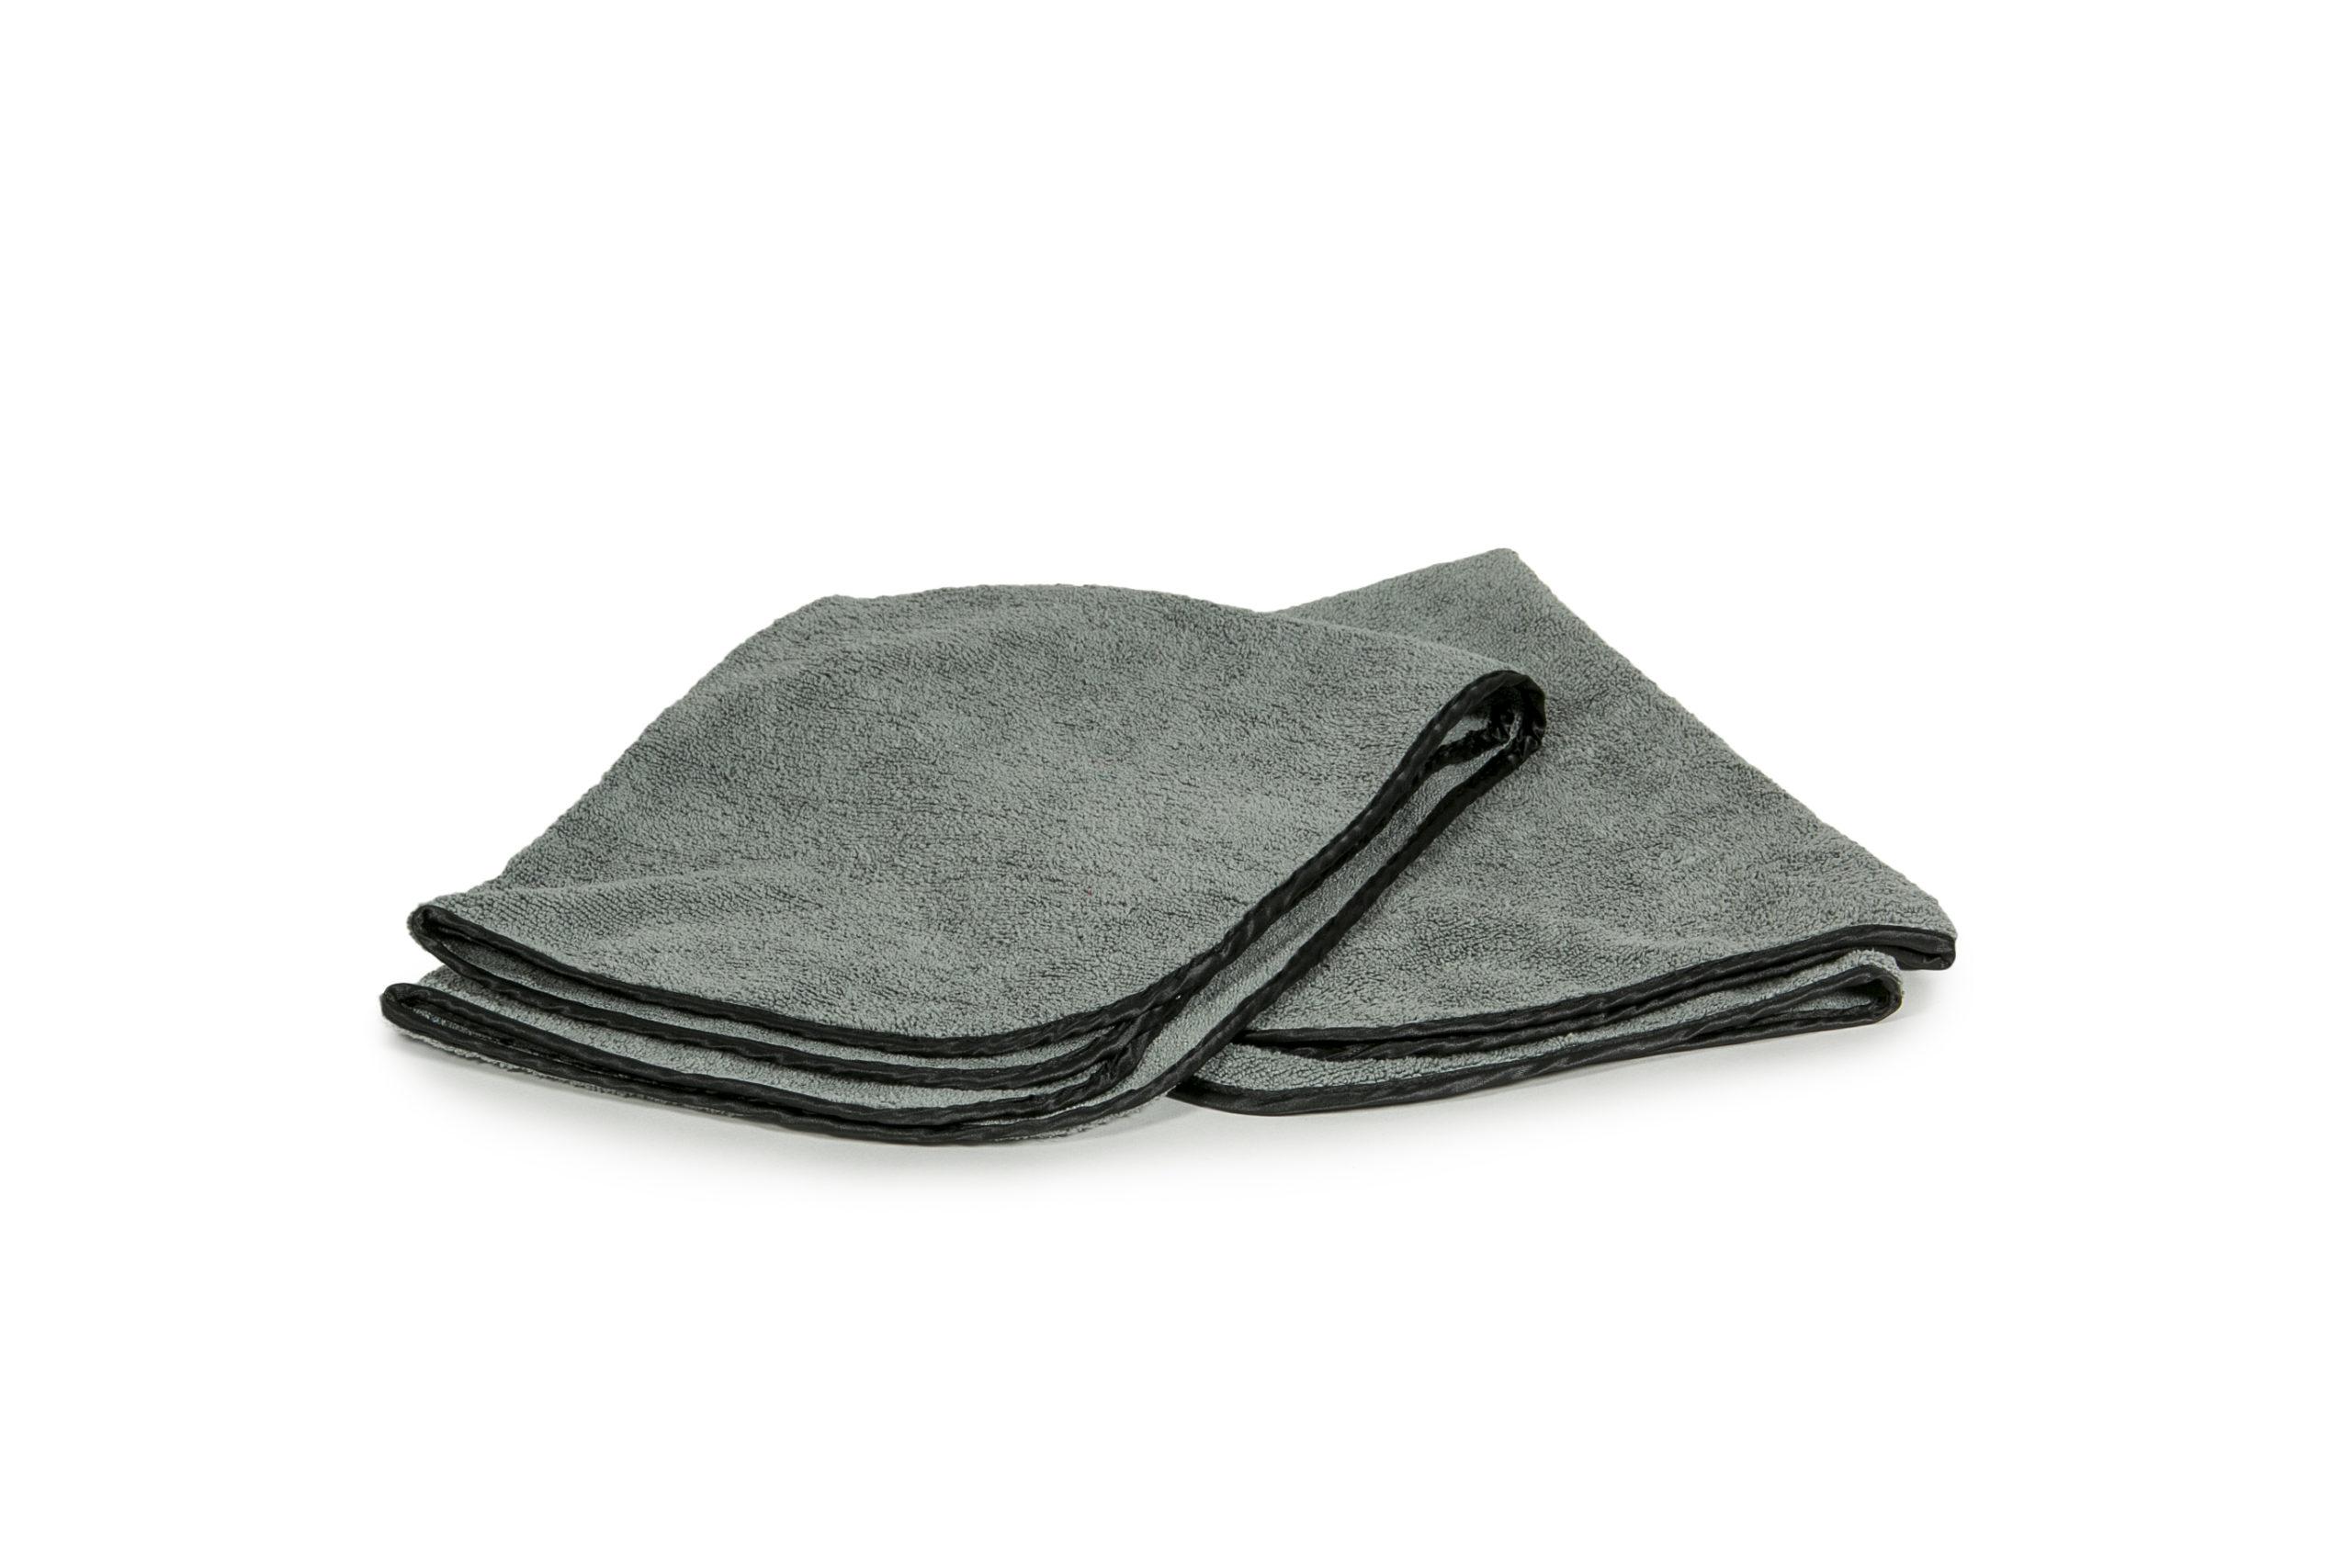 Performance Micro-Fiber Towels